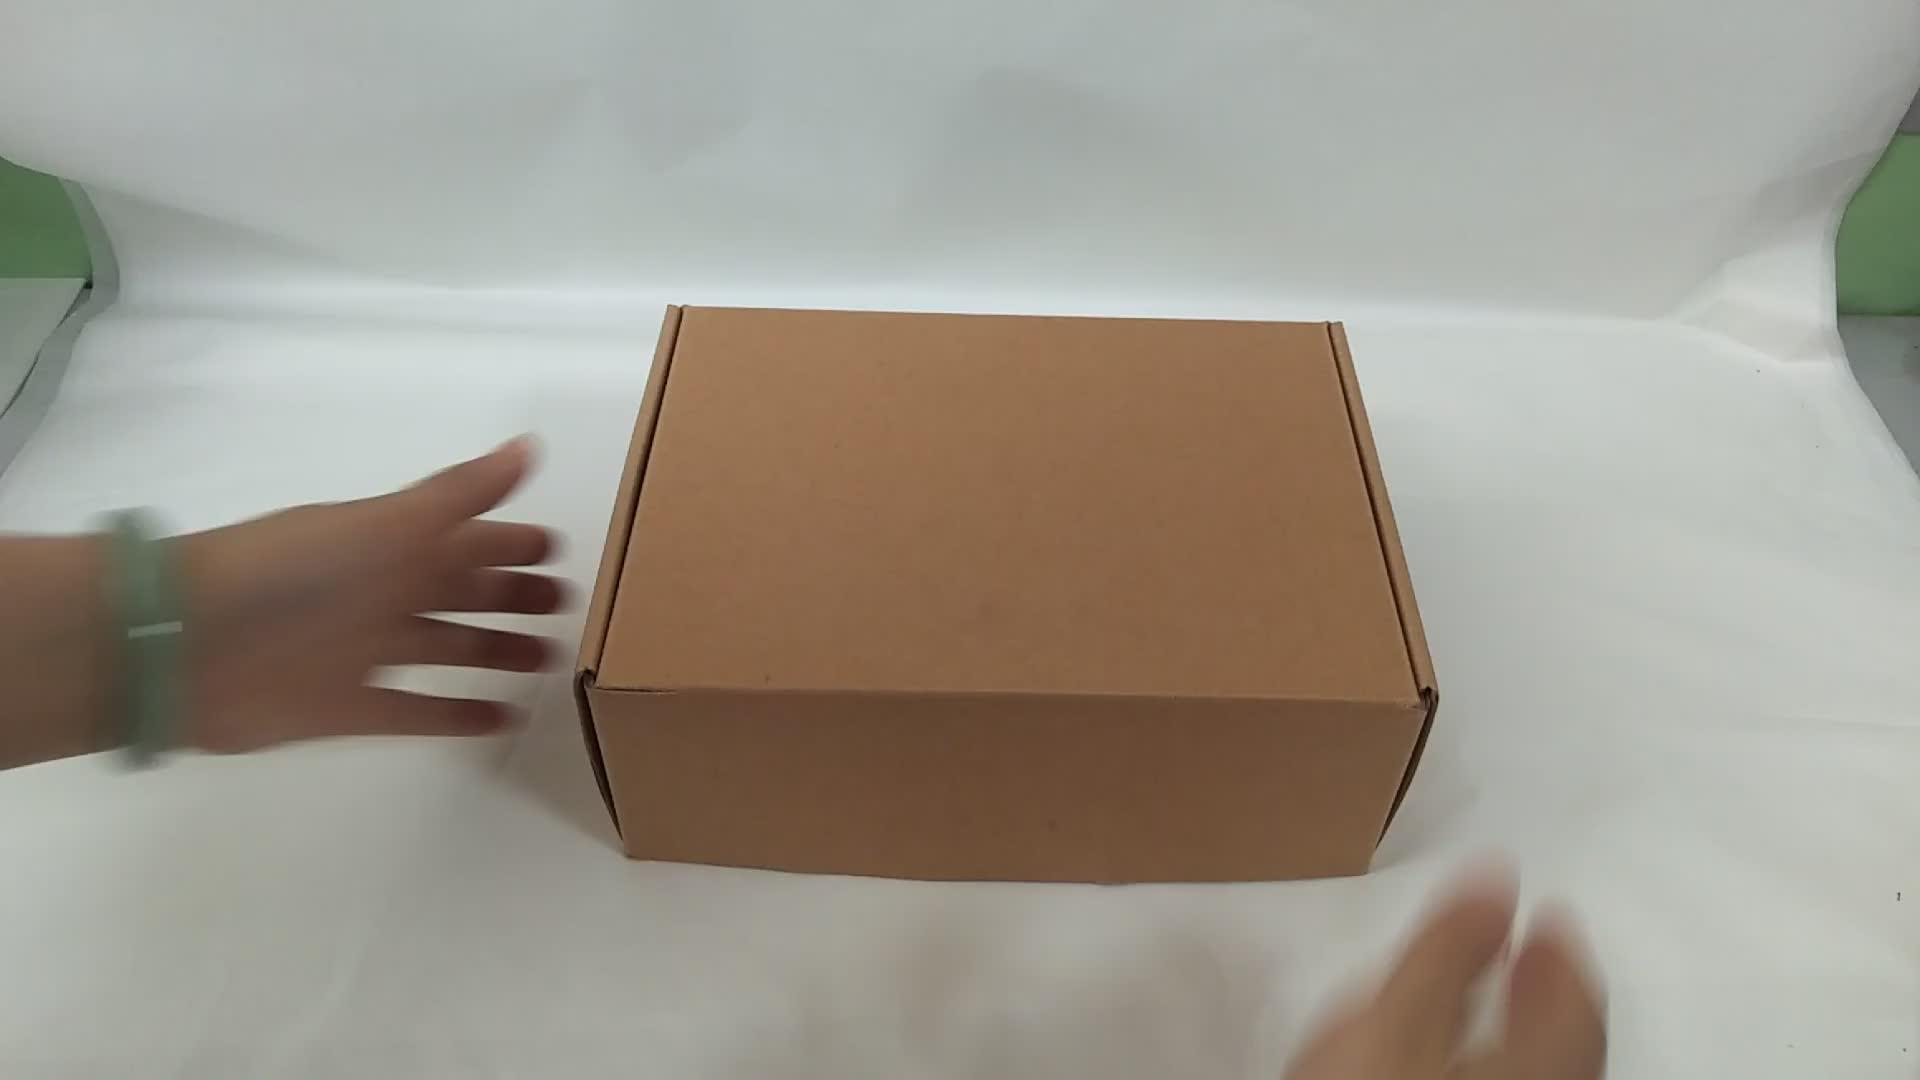 Factory custom print corrugated paper cardboard mailing shipping postal packaging box